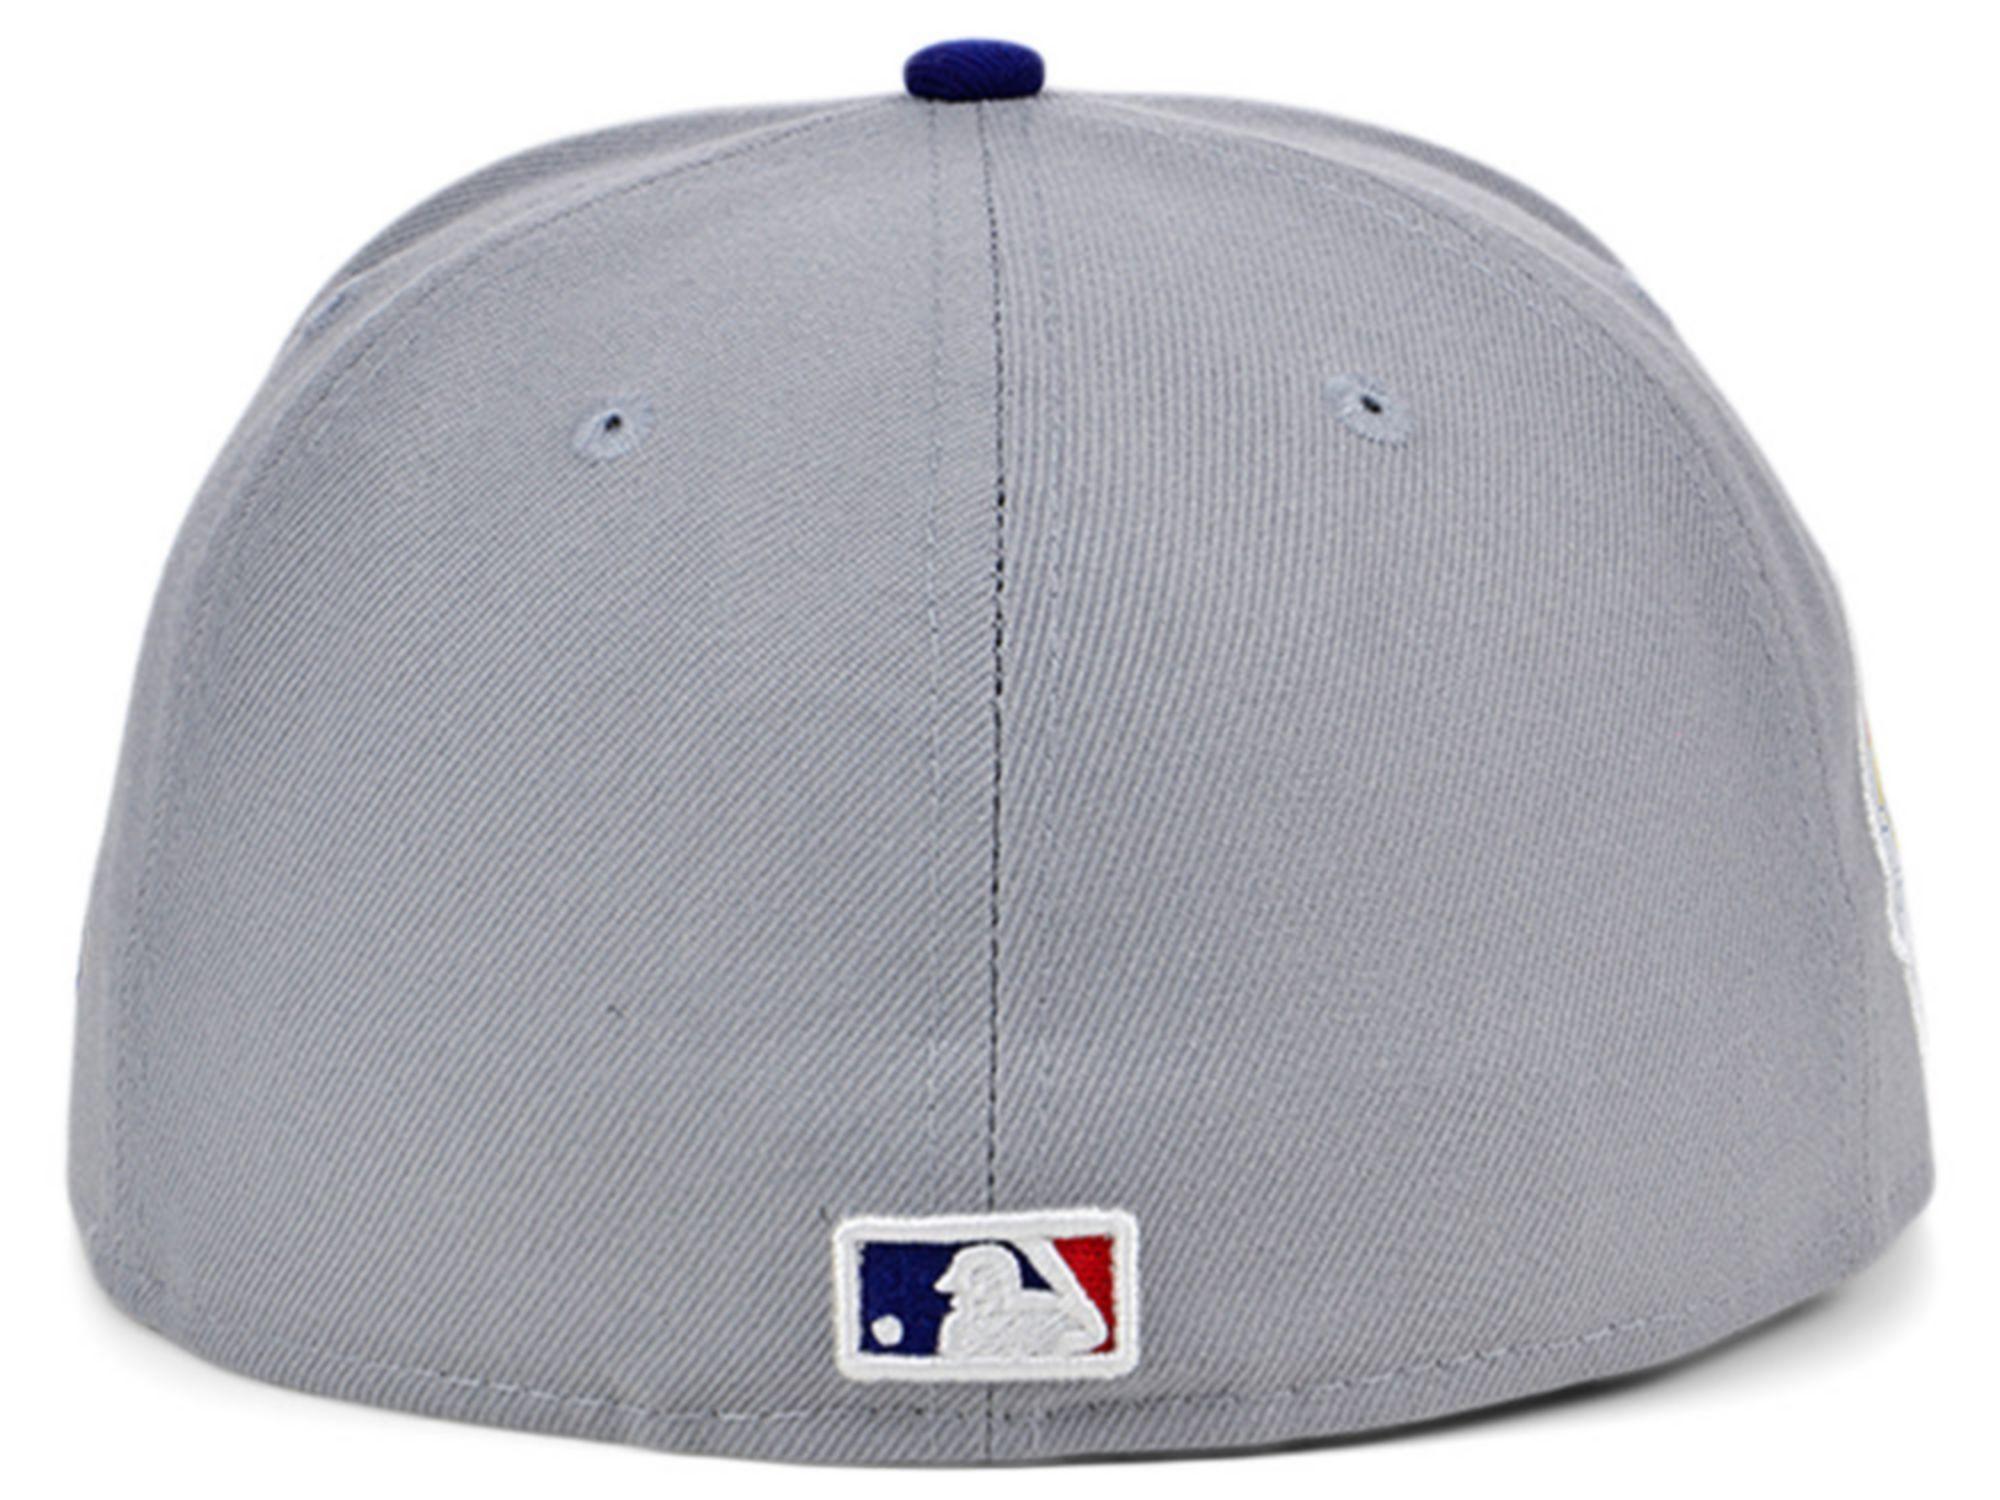 New Era Los Angeles Dodgers Gray Anniversary 59FIFTY Cap & Reviews - MLB - Sports Fan Shop - Macy's